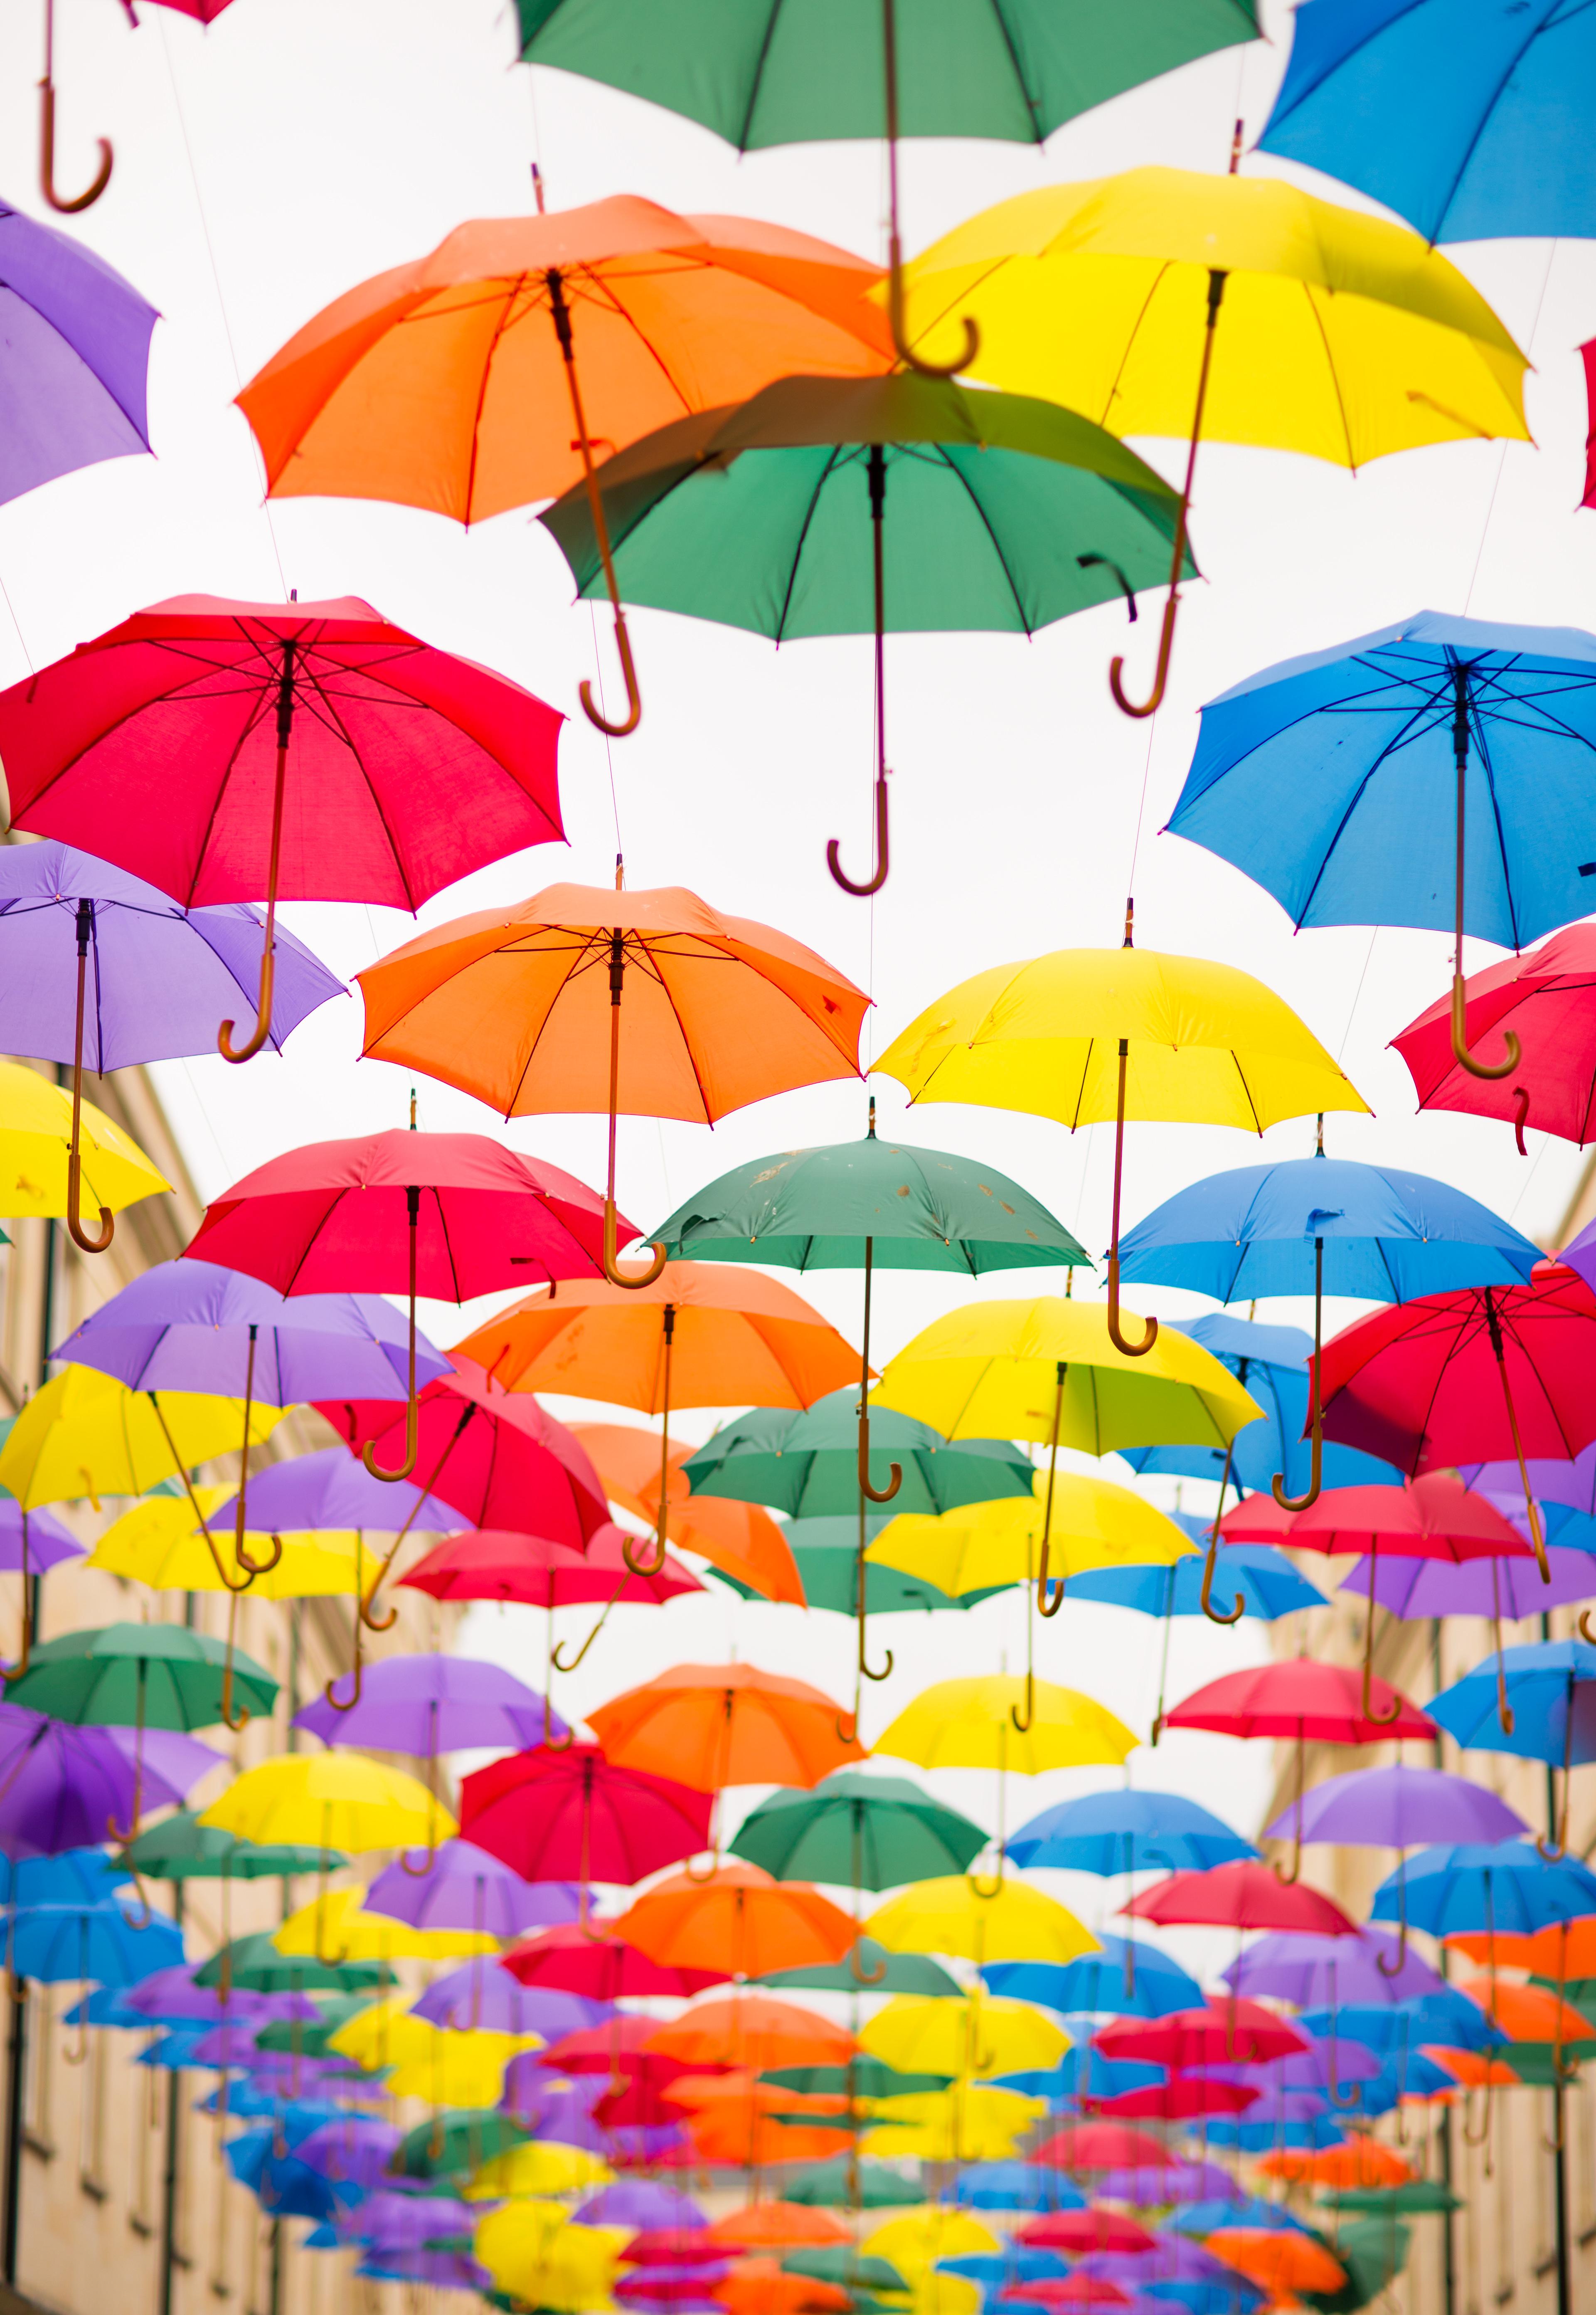 Iphone Wallpaper Grey Pink Grey And Green Folding Umbrella Painting 183 Free Stock